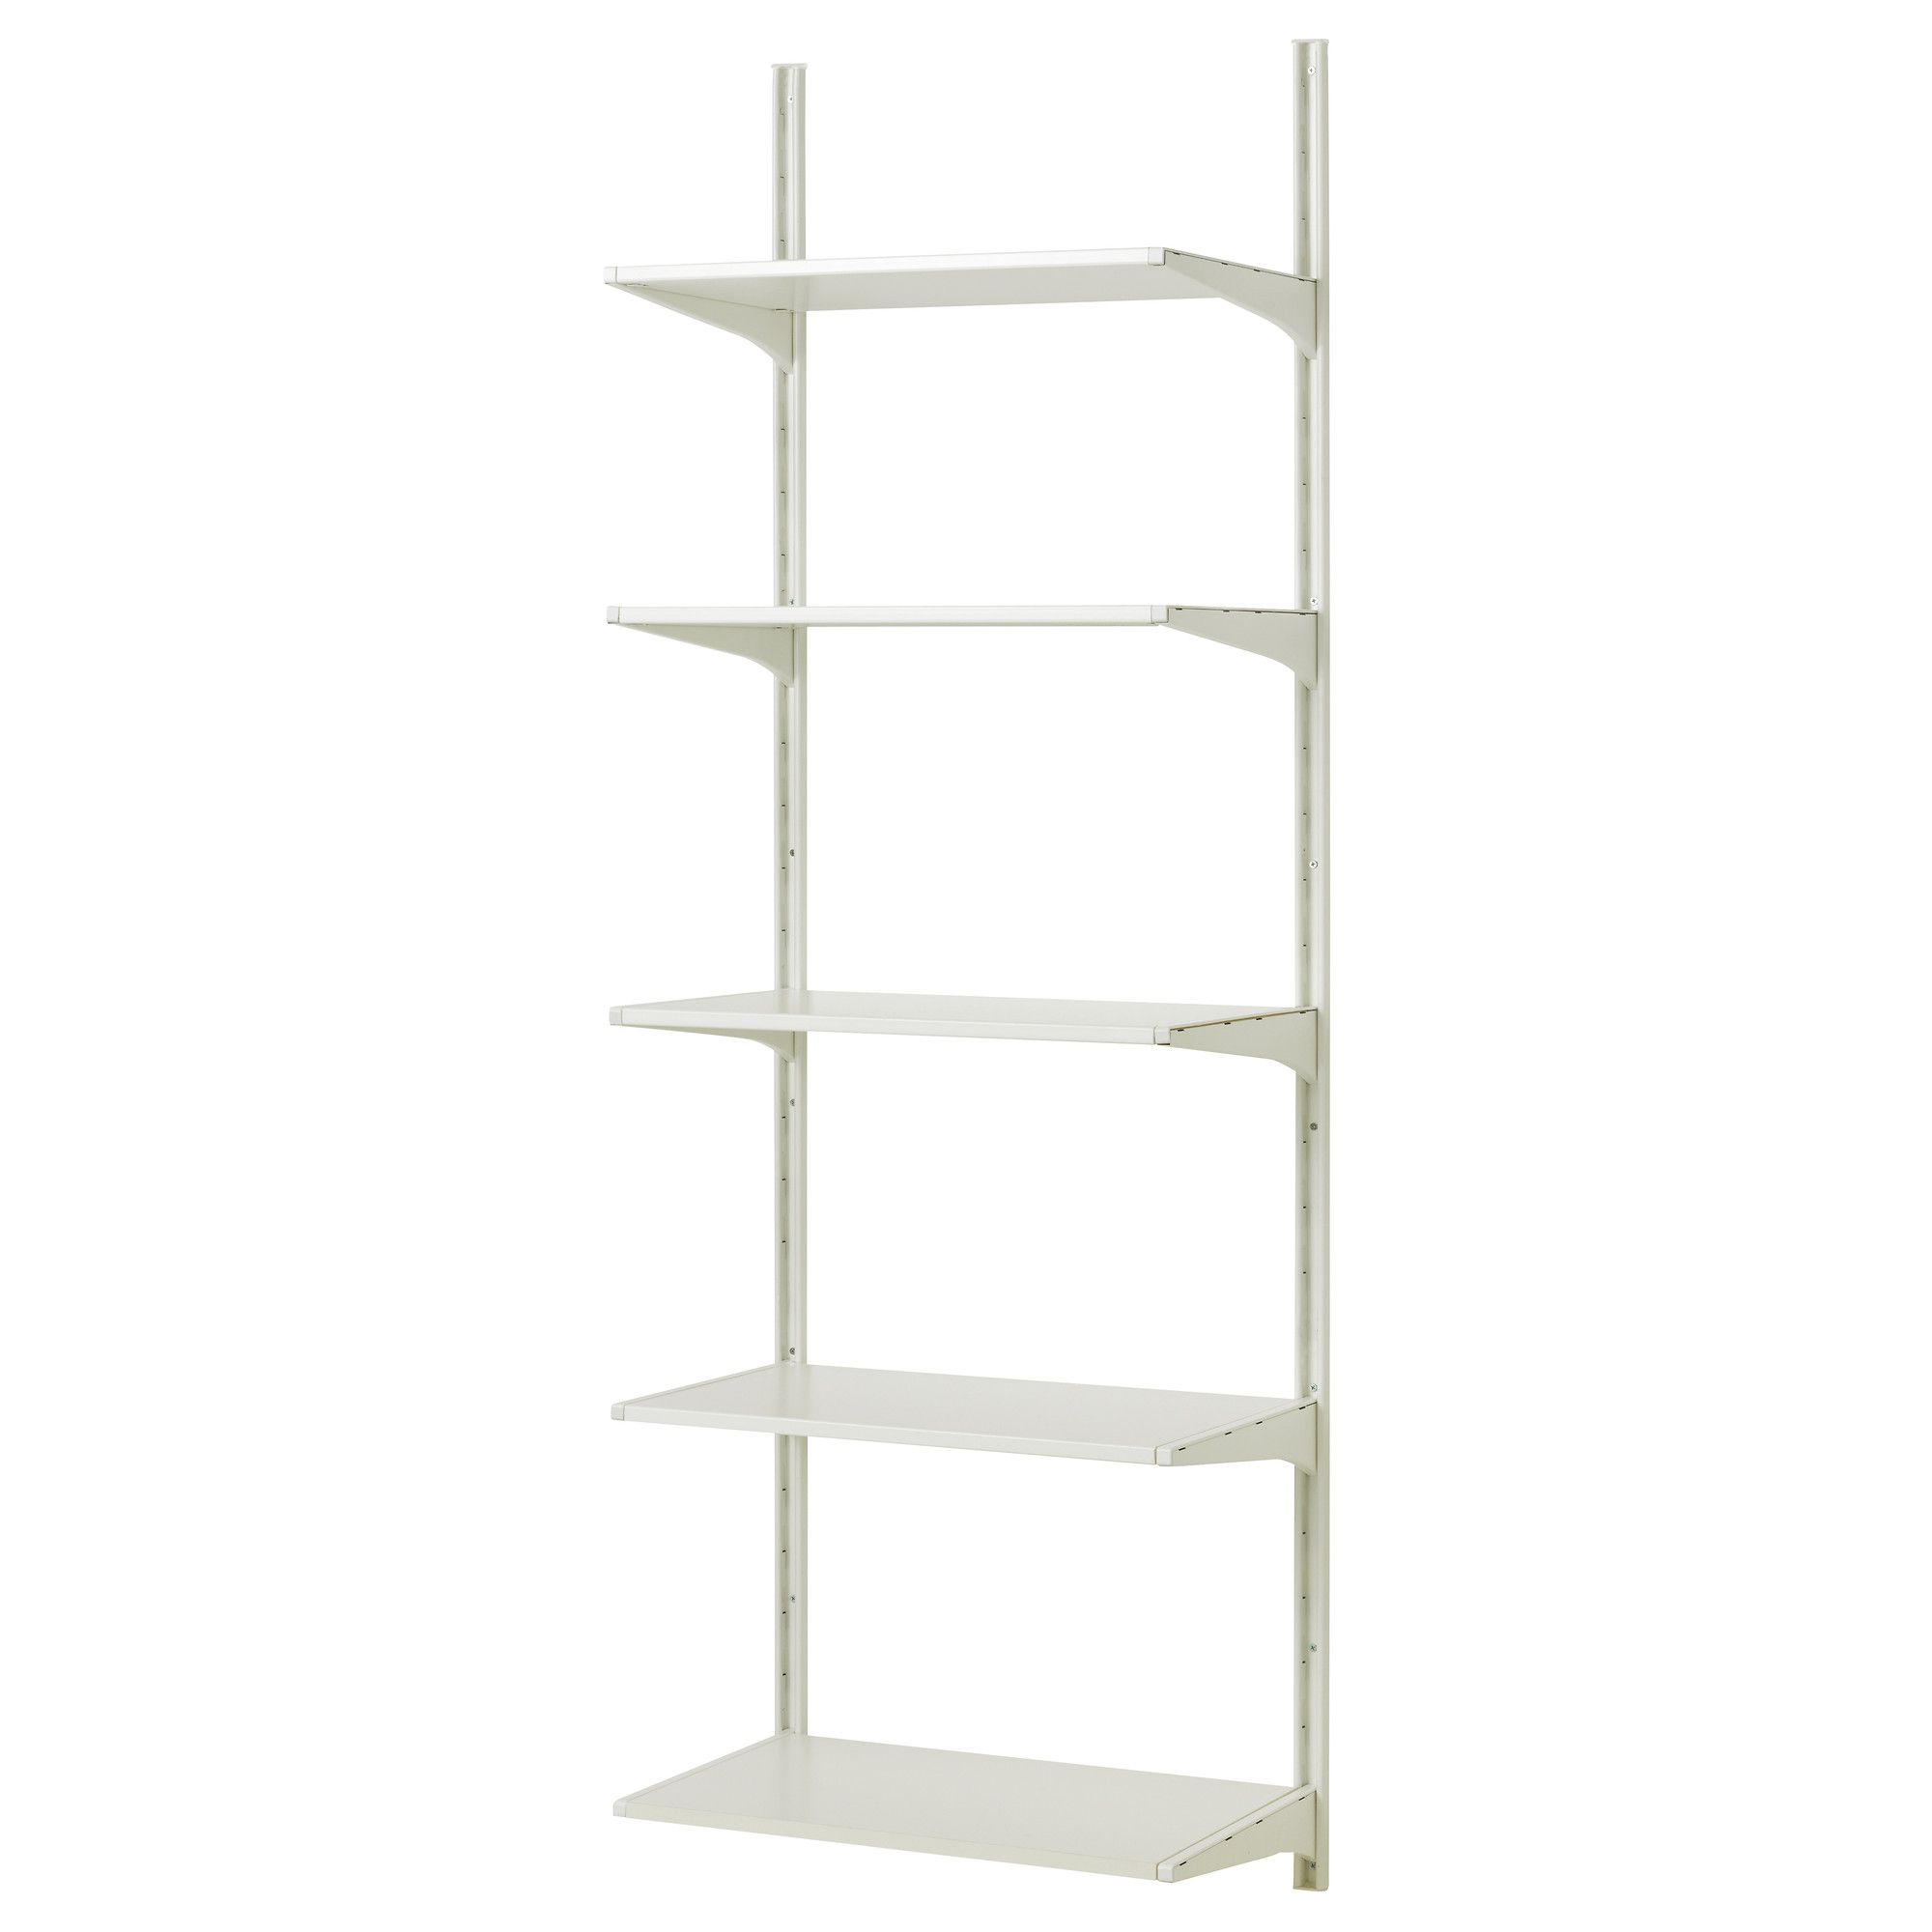 Algot Wall Upright Shelves White 25 5 8x15 3 4x77 1 8 Ikea